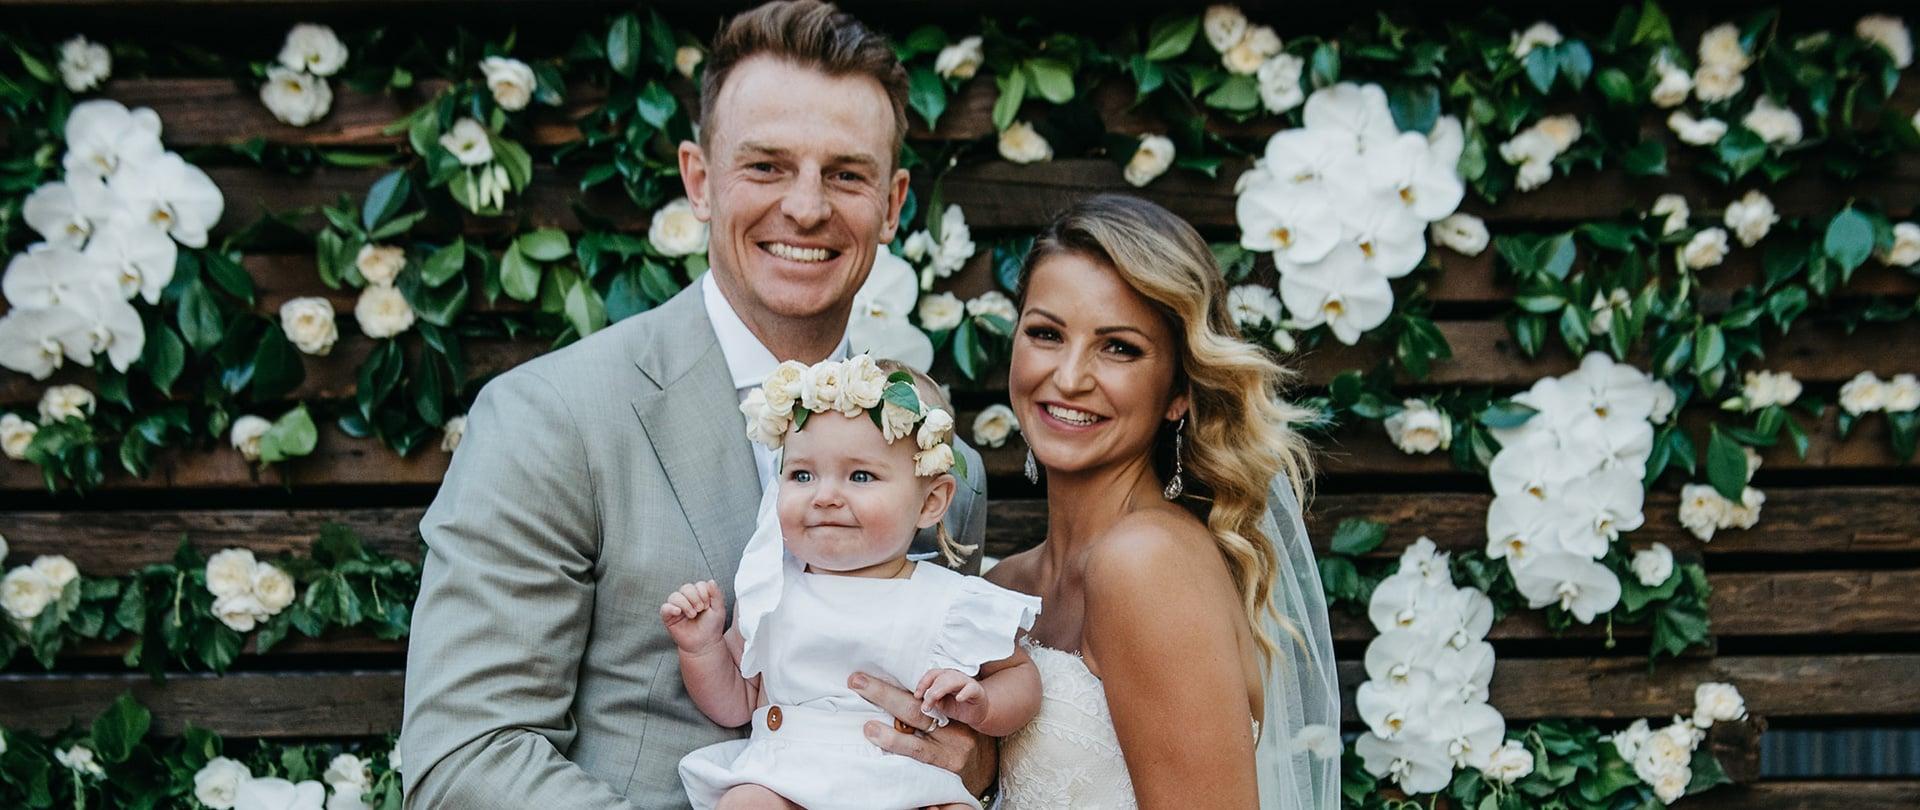 Rosie & Brendon Wedding Video Filmed at Melbourne, Victoria